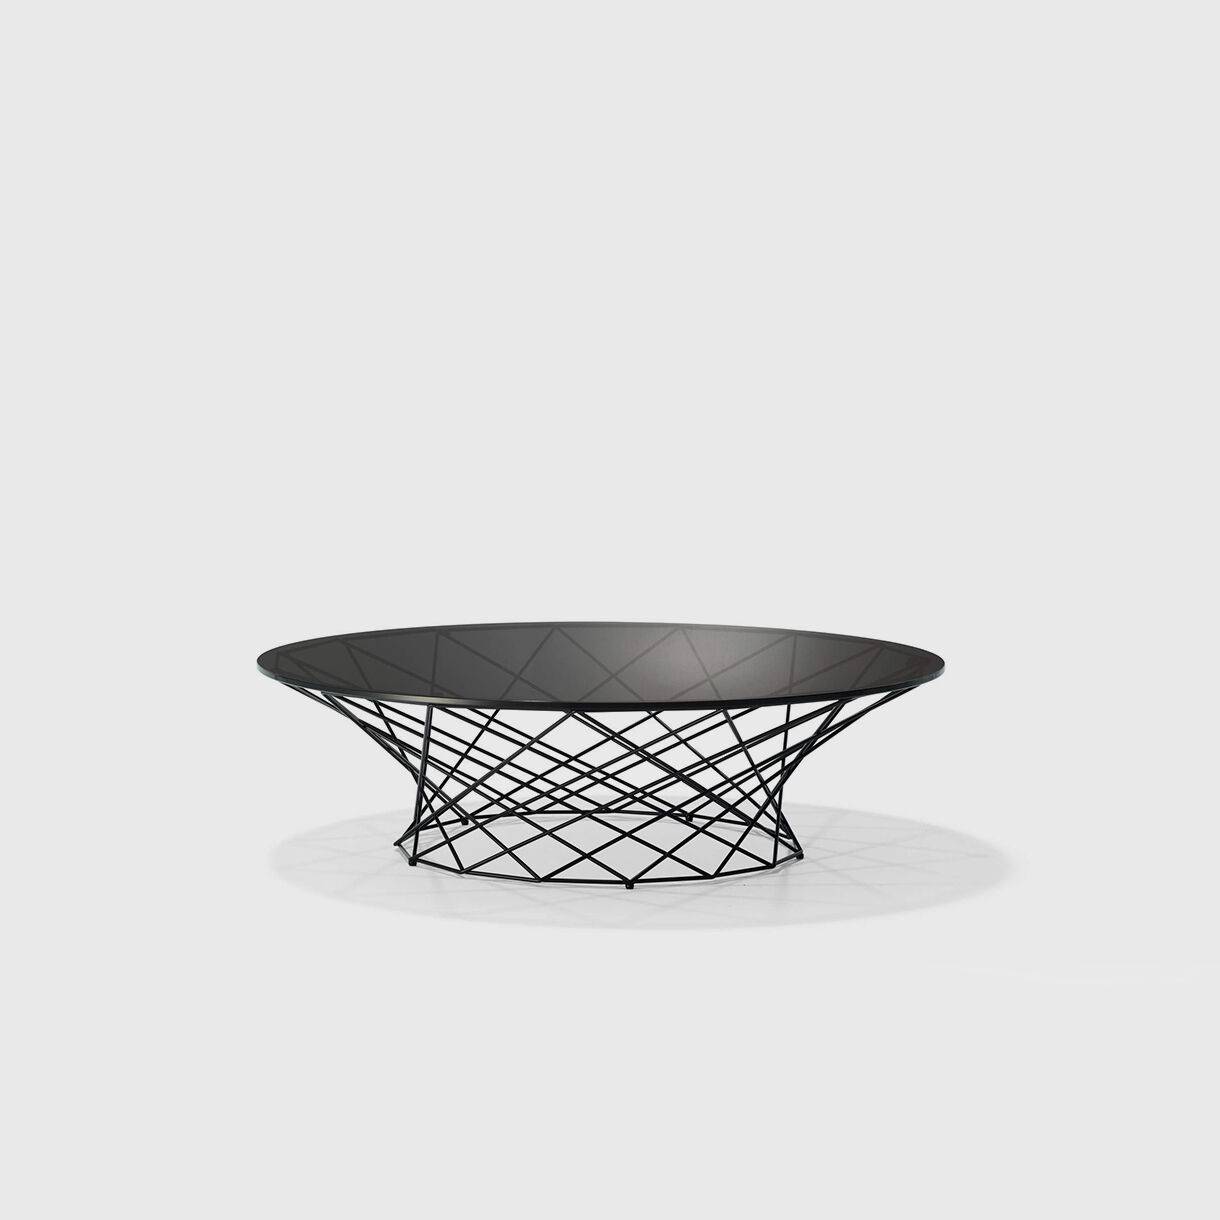 Oota Coffee Table, T3 Small, Black